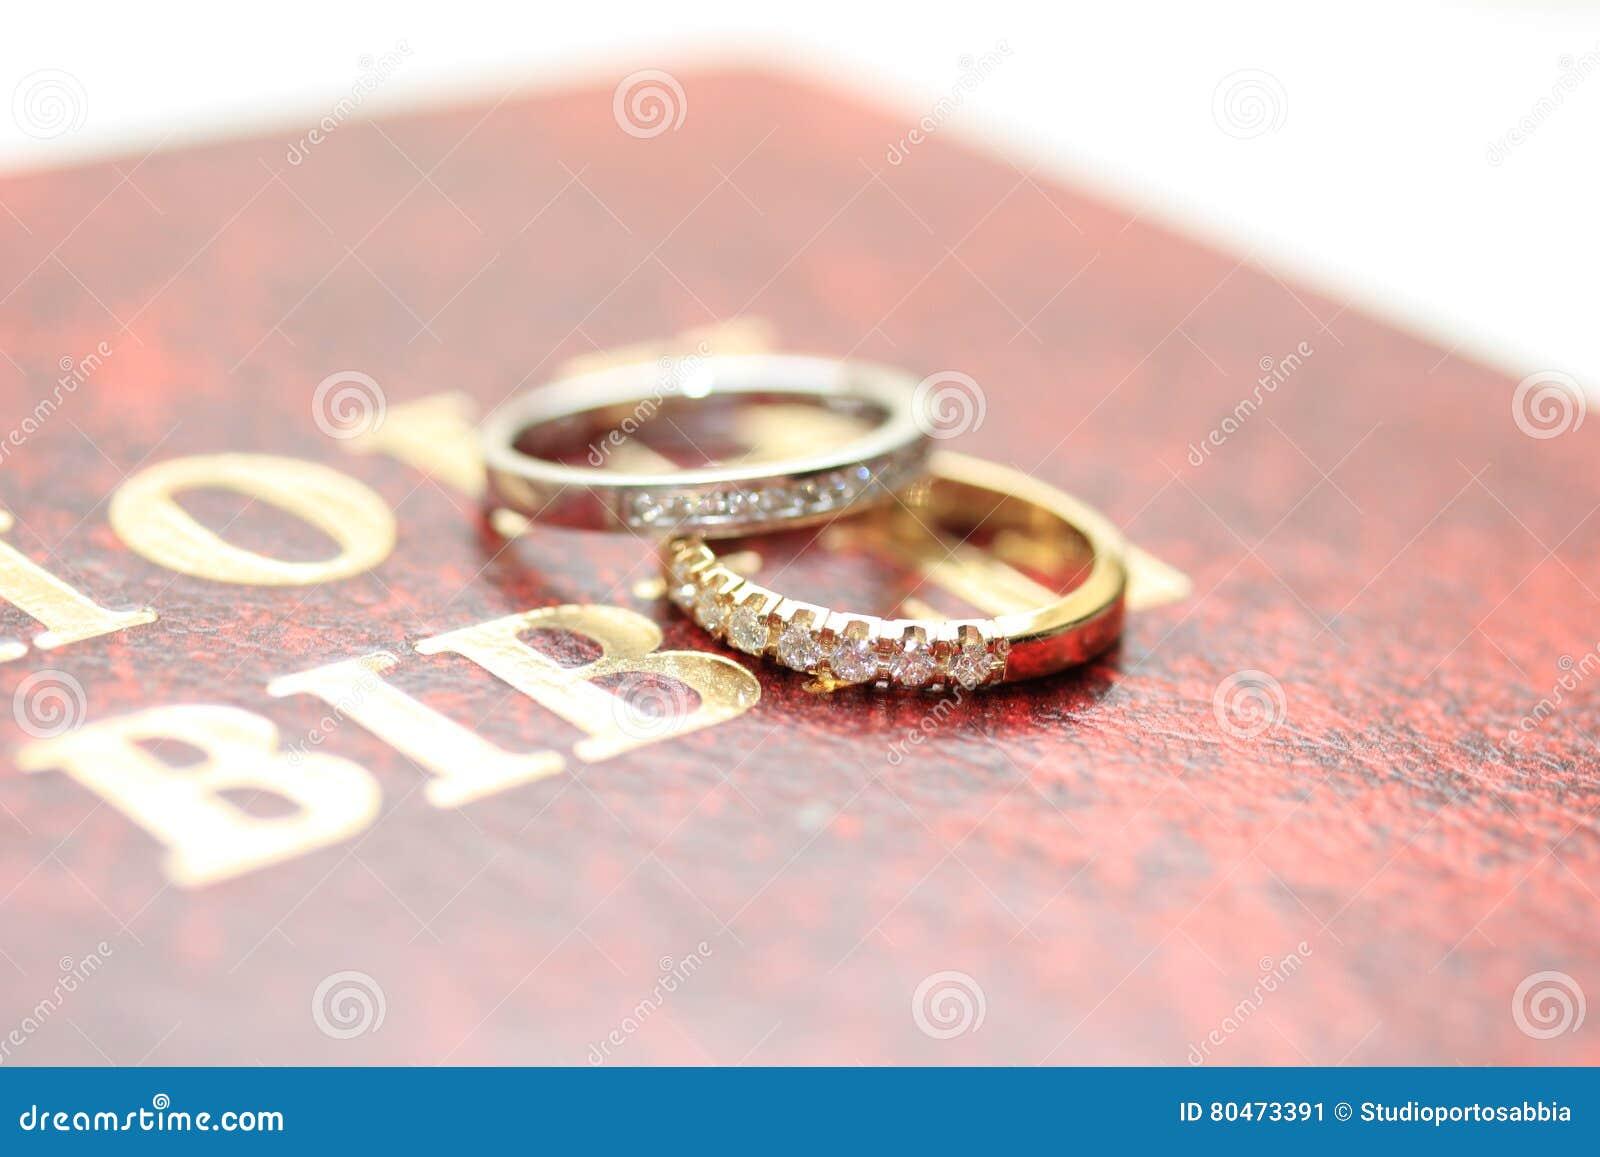 Diamond wedding bands stock image. Image of wedding, carat - 80473391